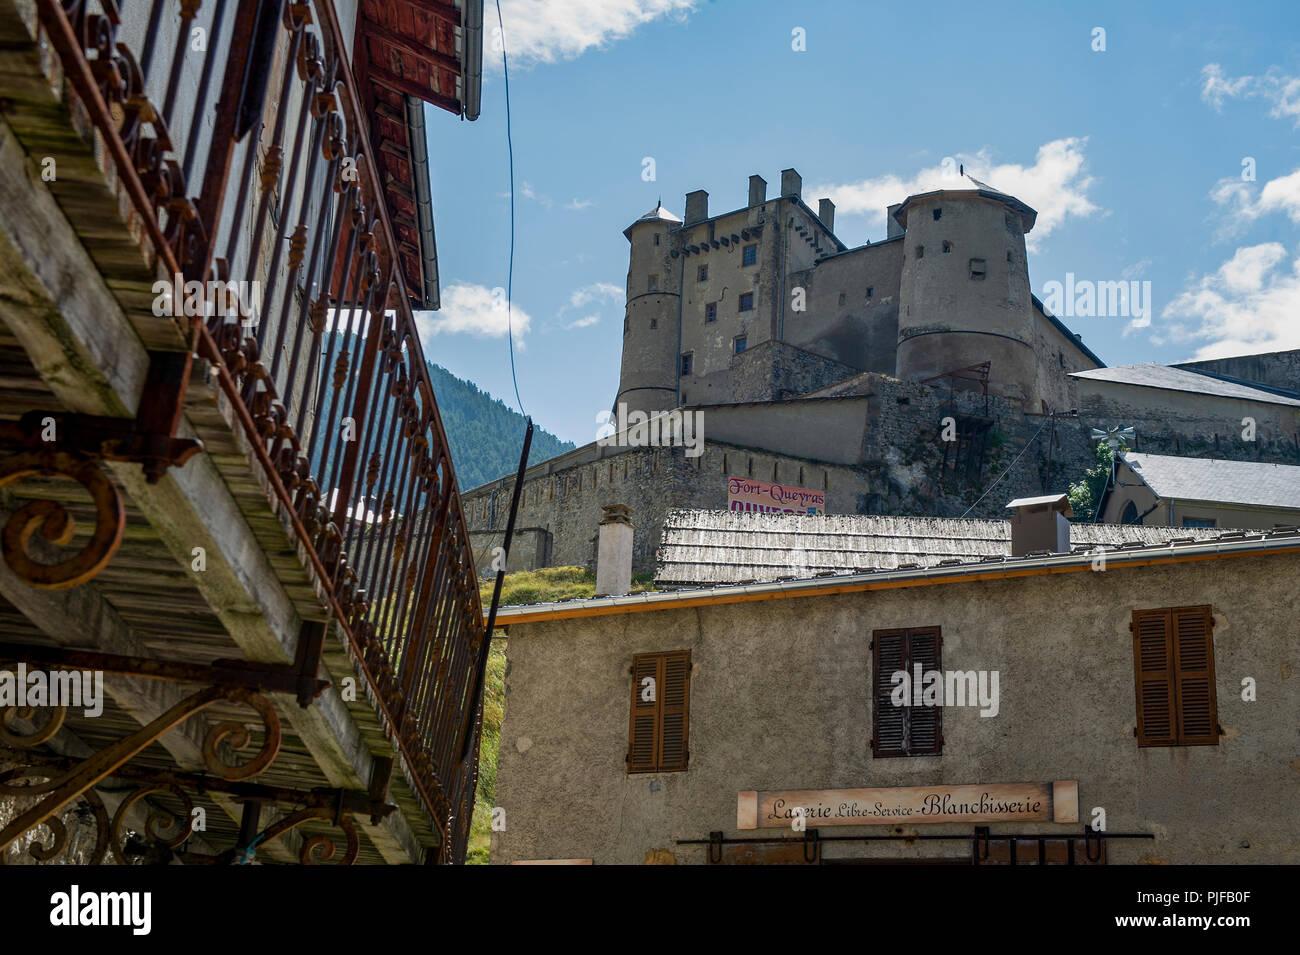 Klettersteig Chateau Queyras : Queyras stockfotos bilder alamy